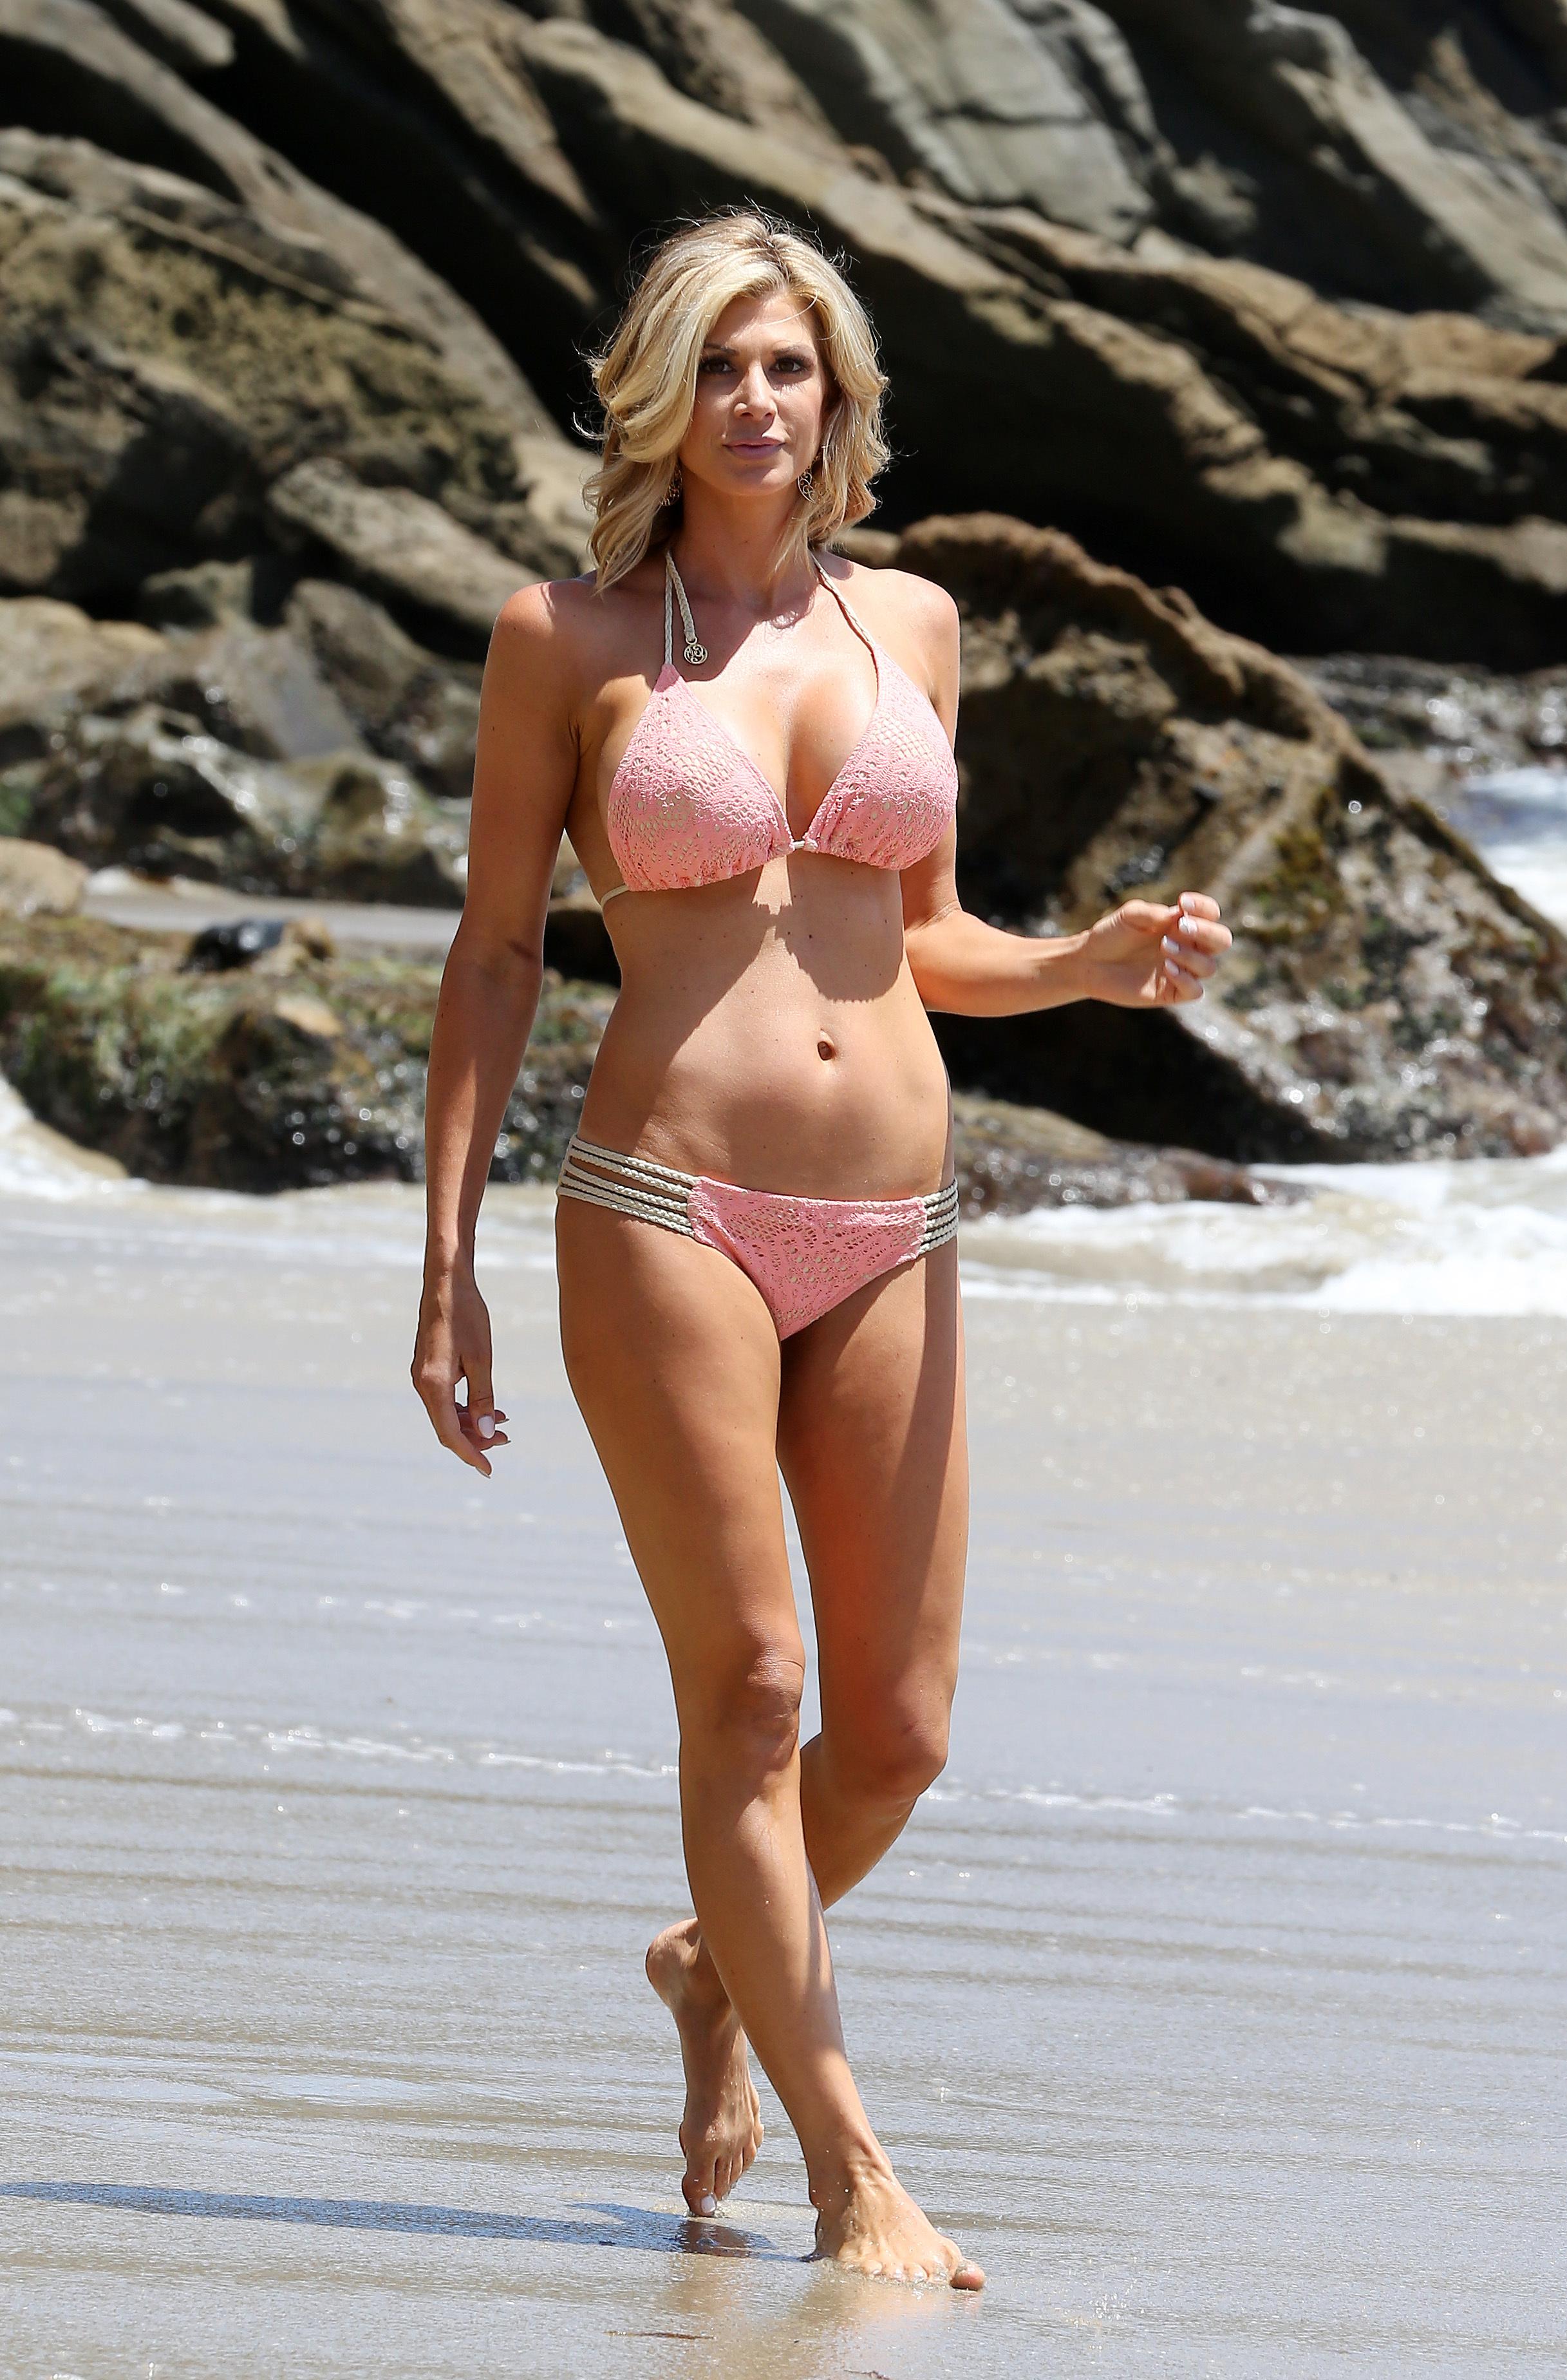 Alexis bellino bikini